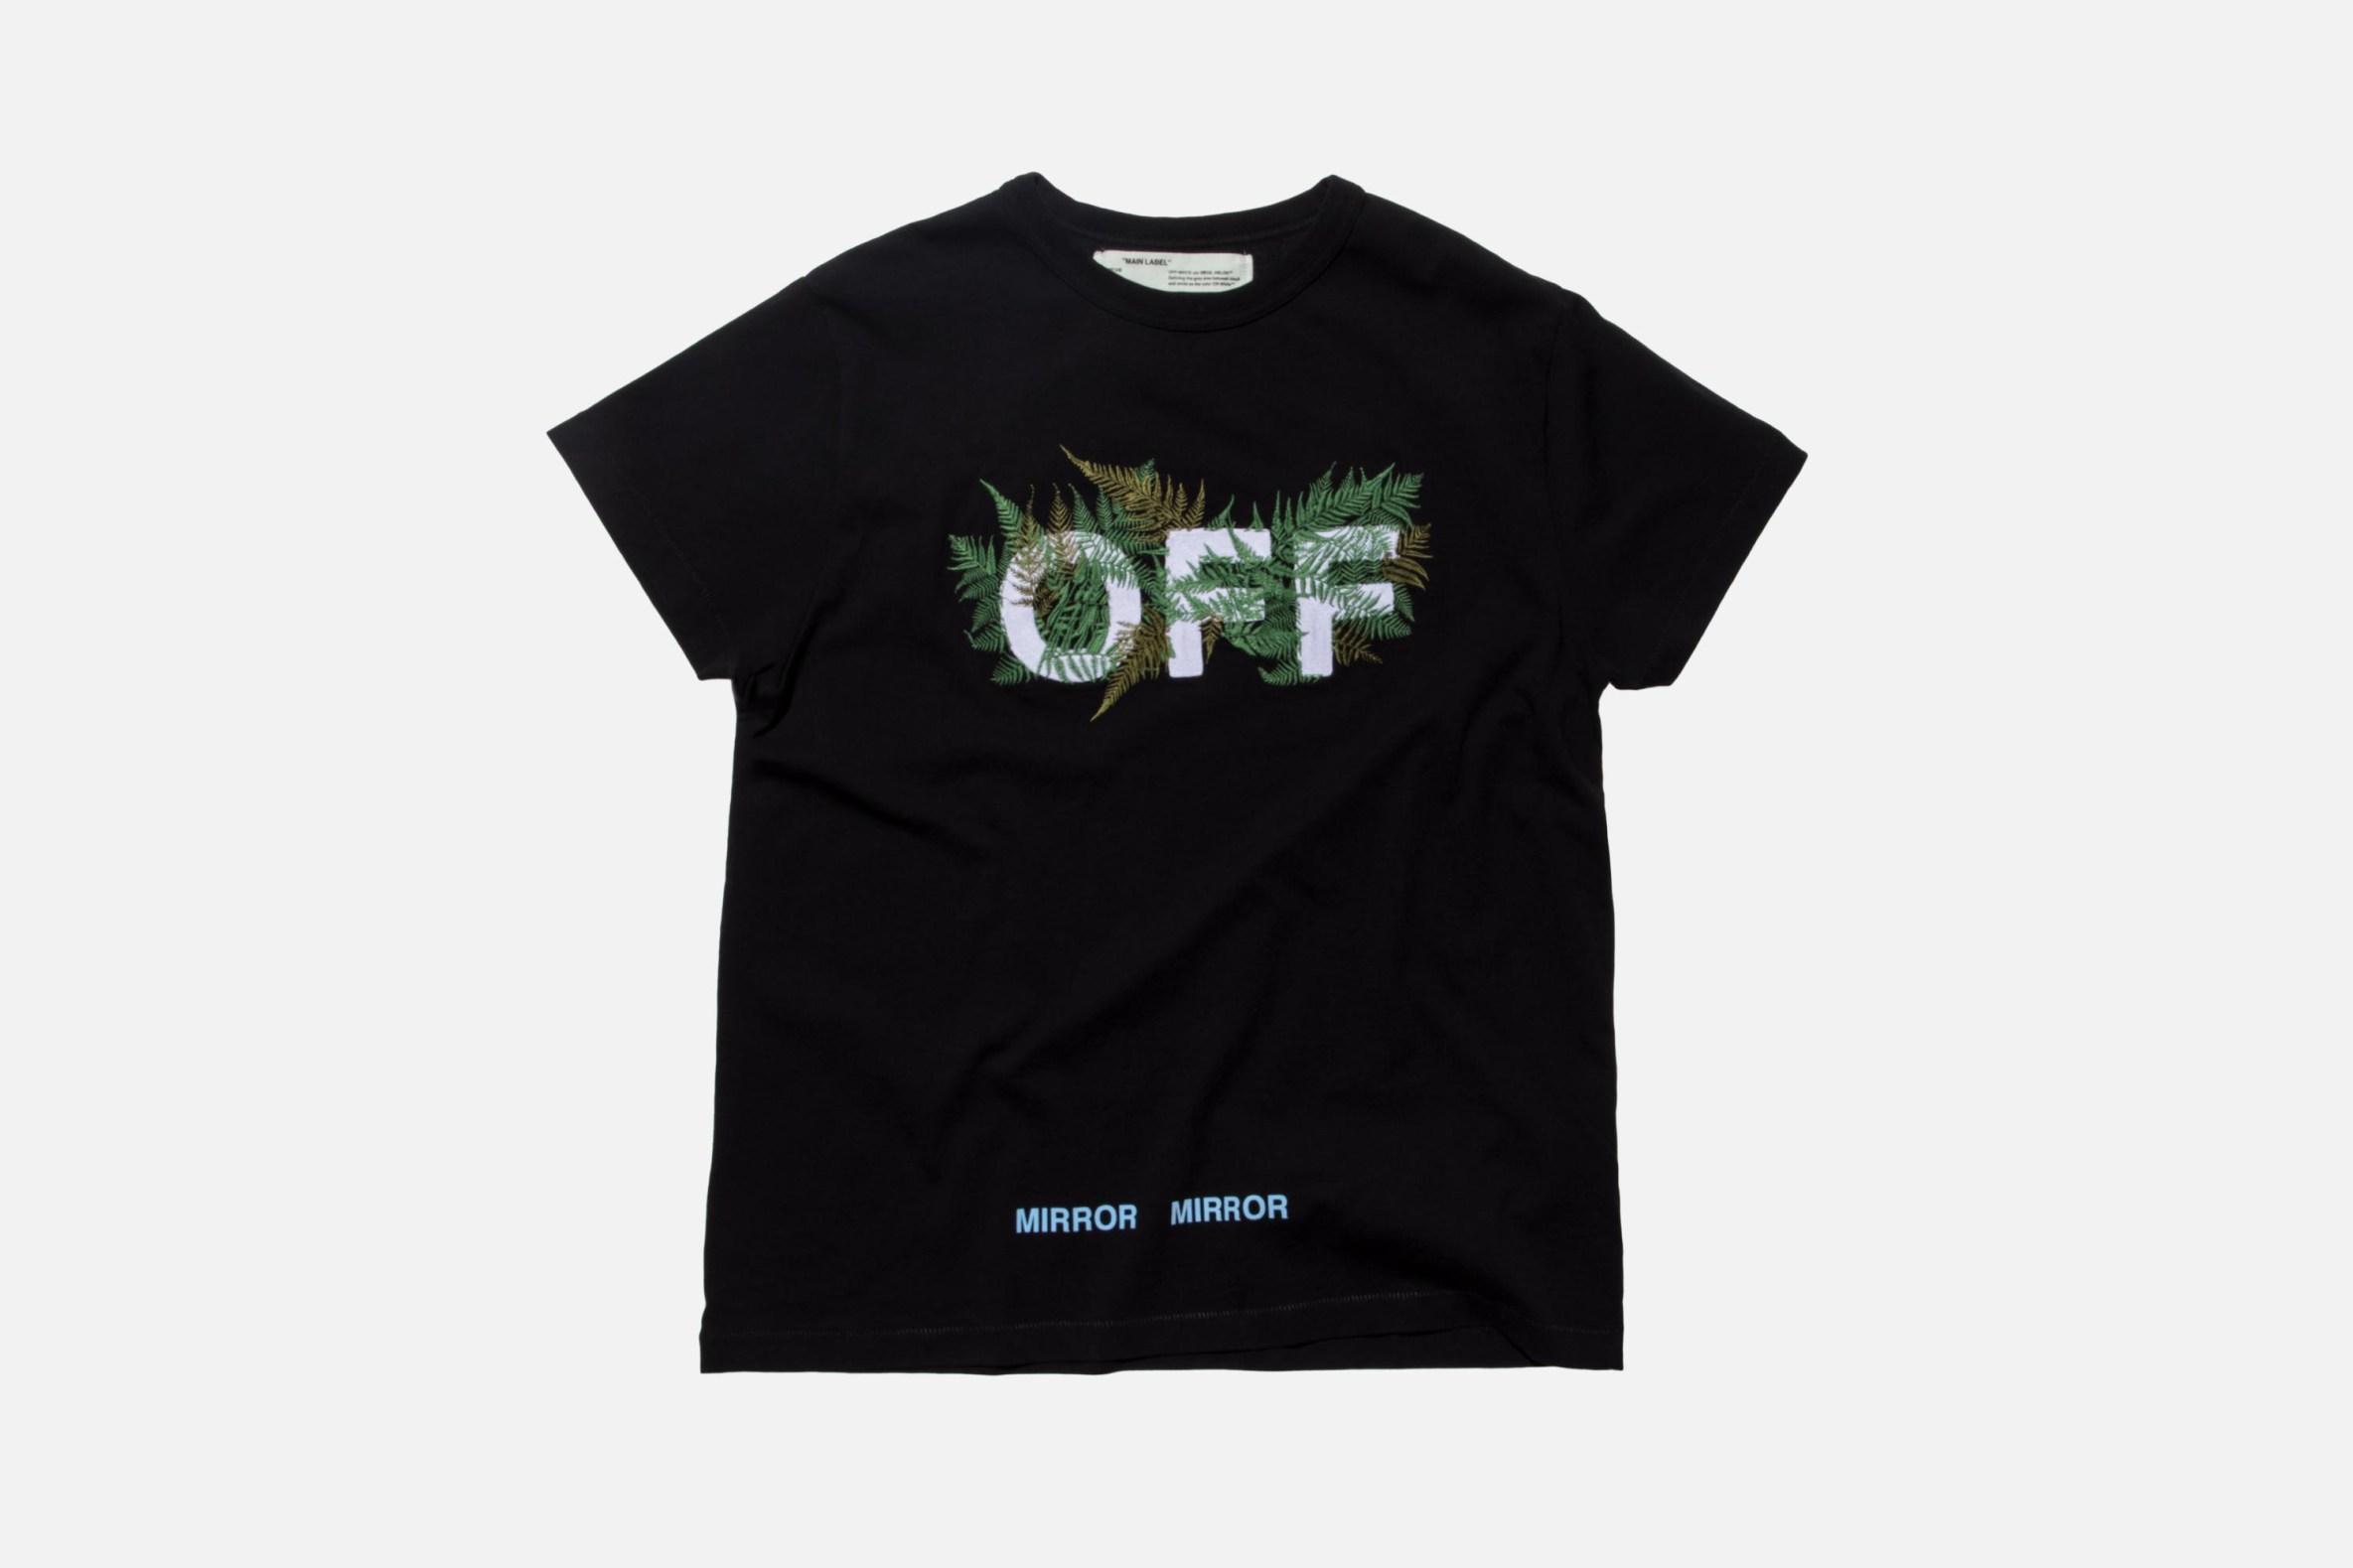 off-white-mirror-mirror-t-shirts-buy-now-1